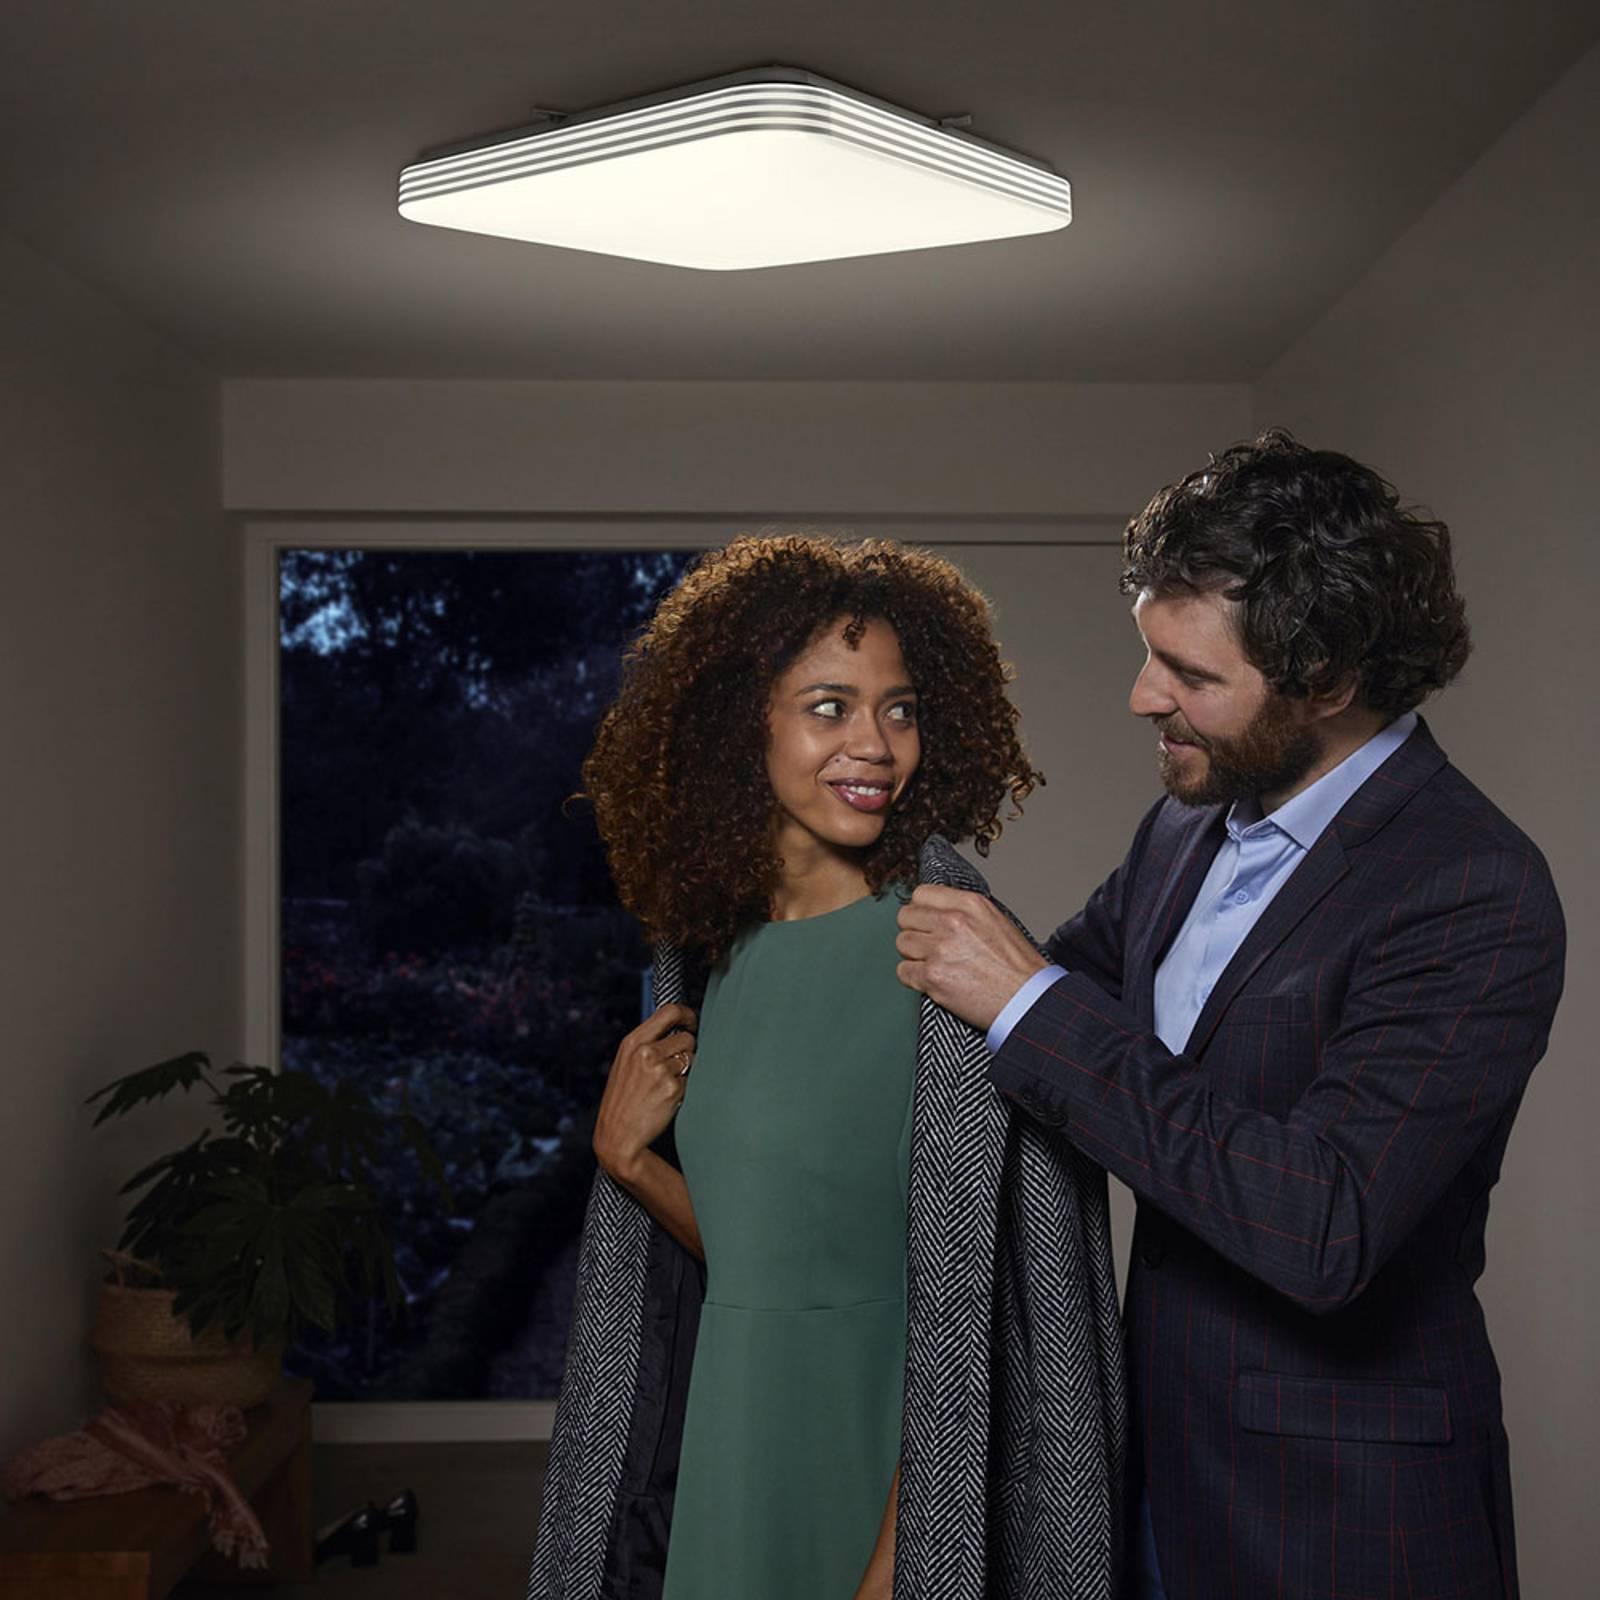 Ledvance Orbis Sensor LED plafondlamp hoekig 43cm